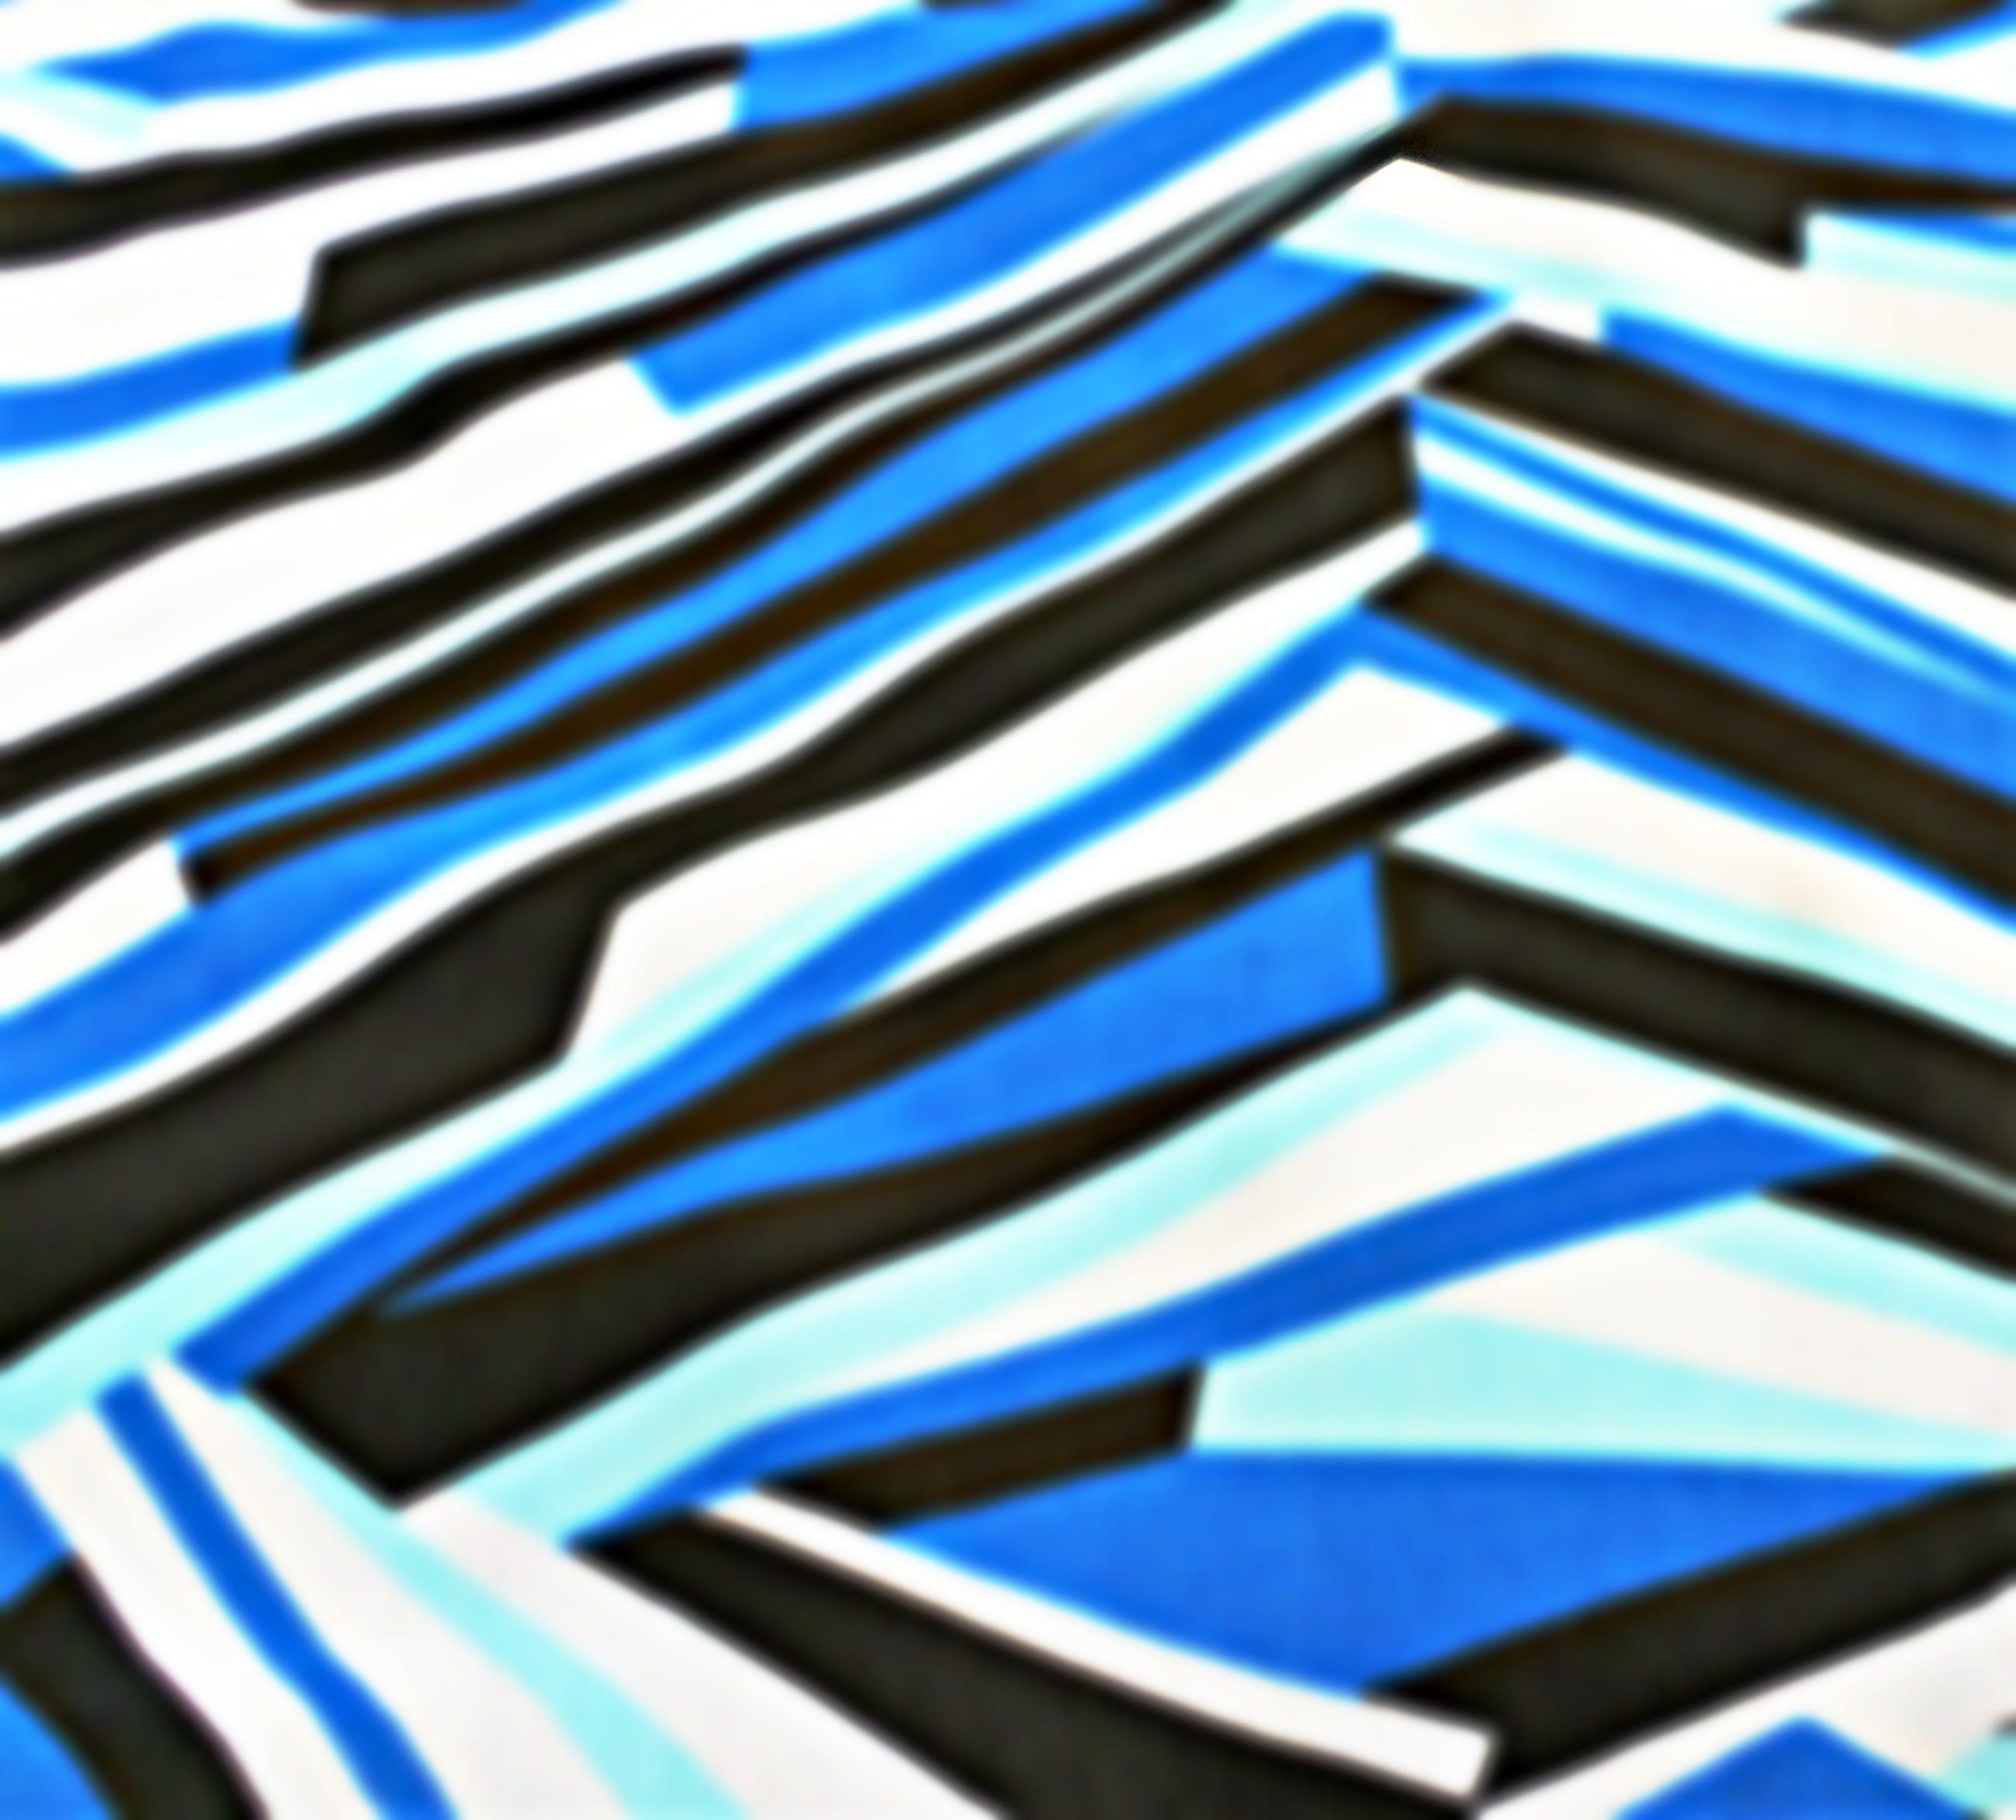 Free stock photo of background, blue, fabric, stripes